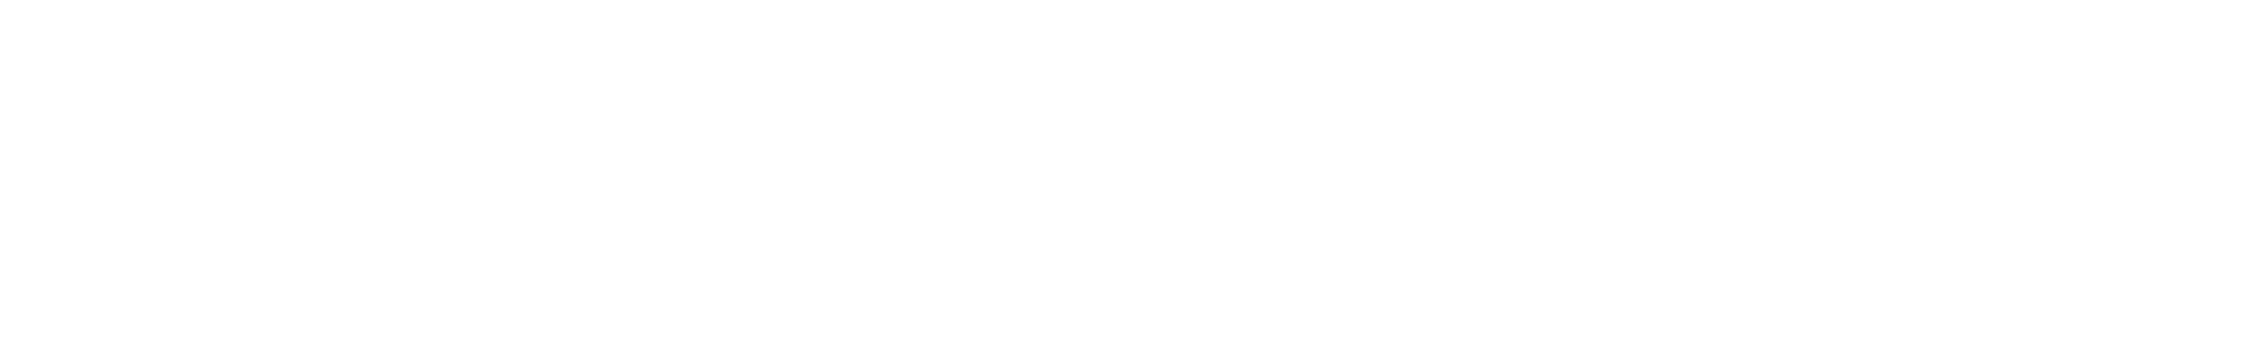 Tow a Fridge